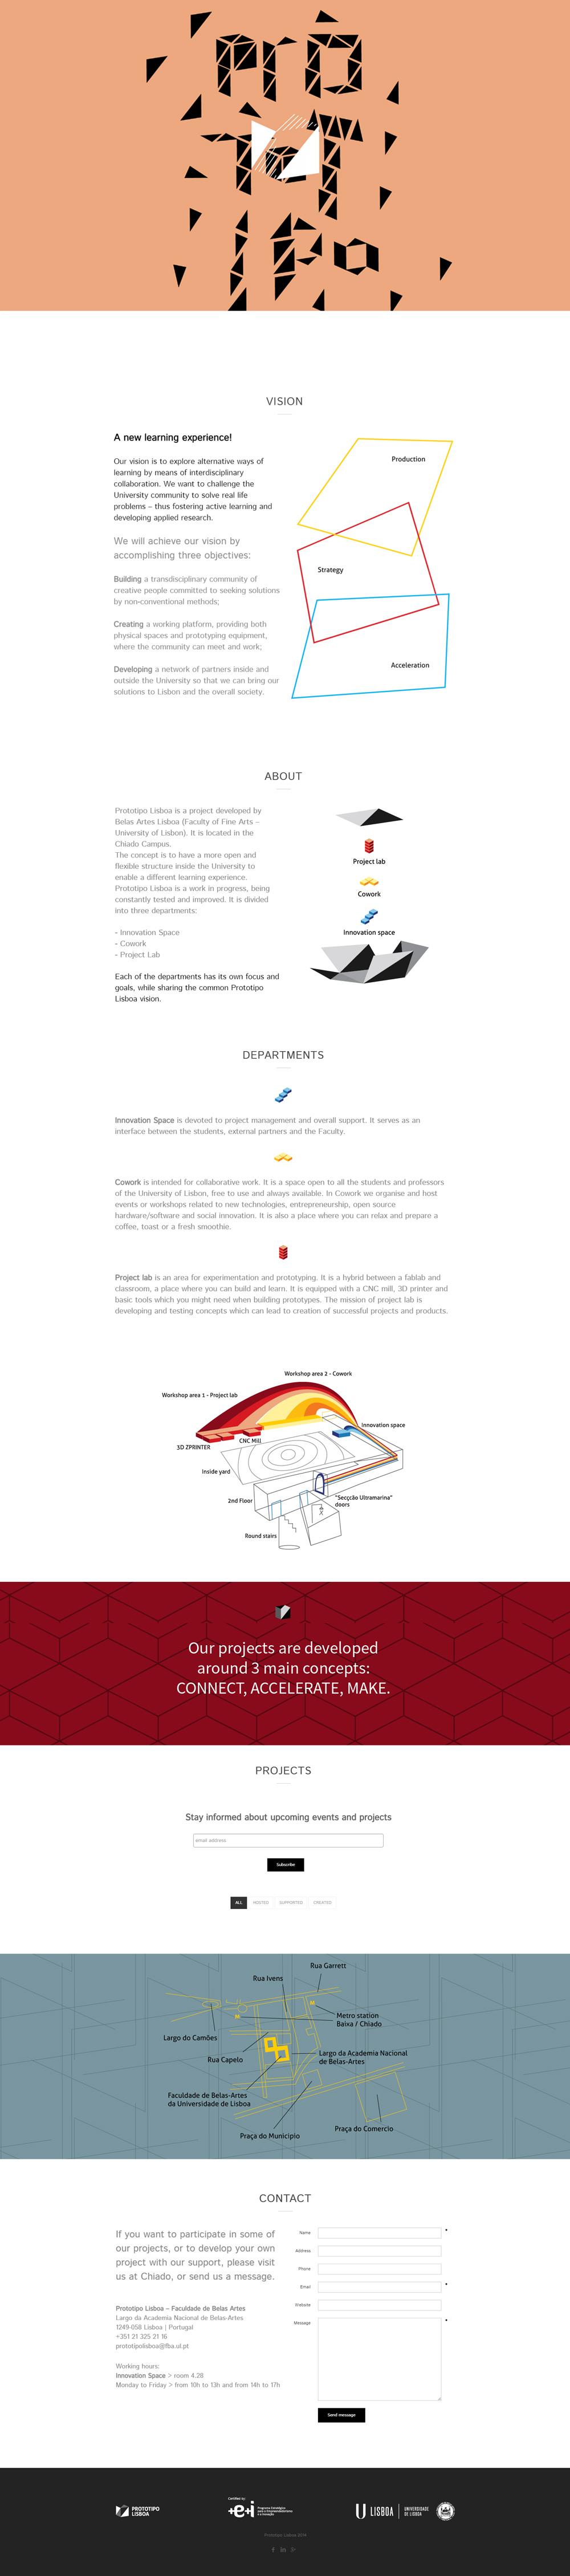 web-prototipo-02